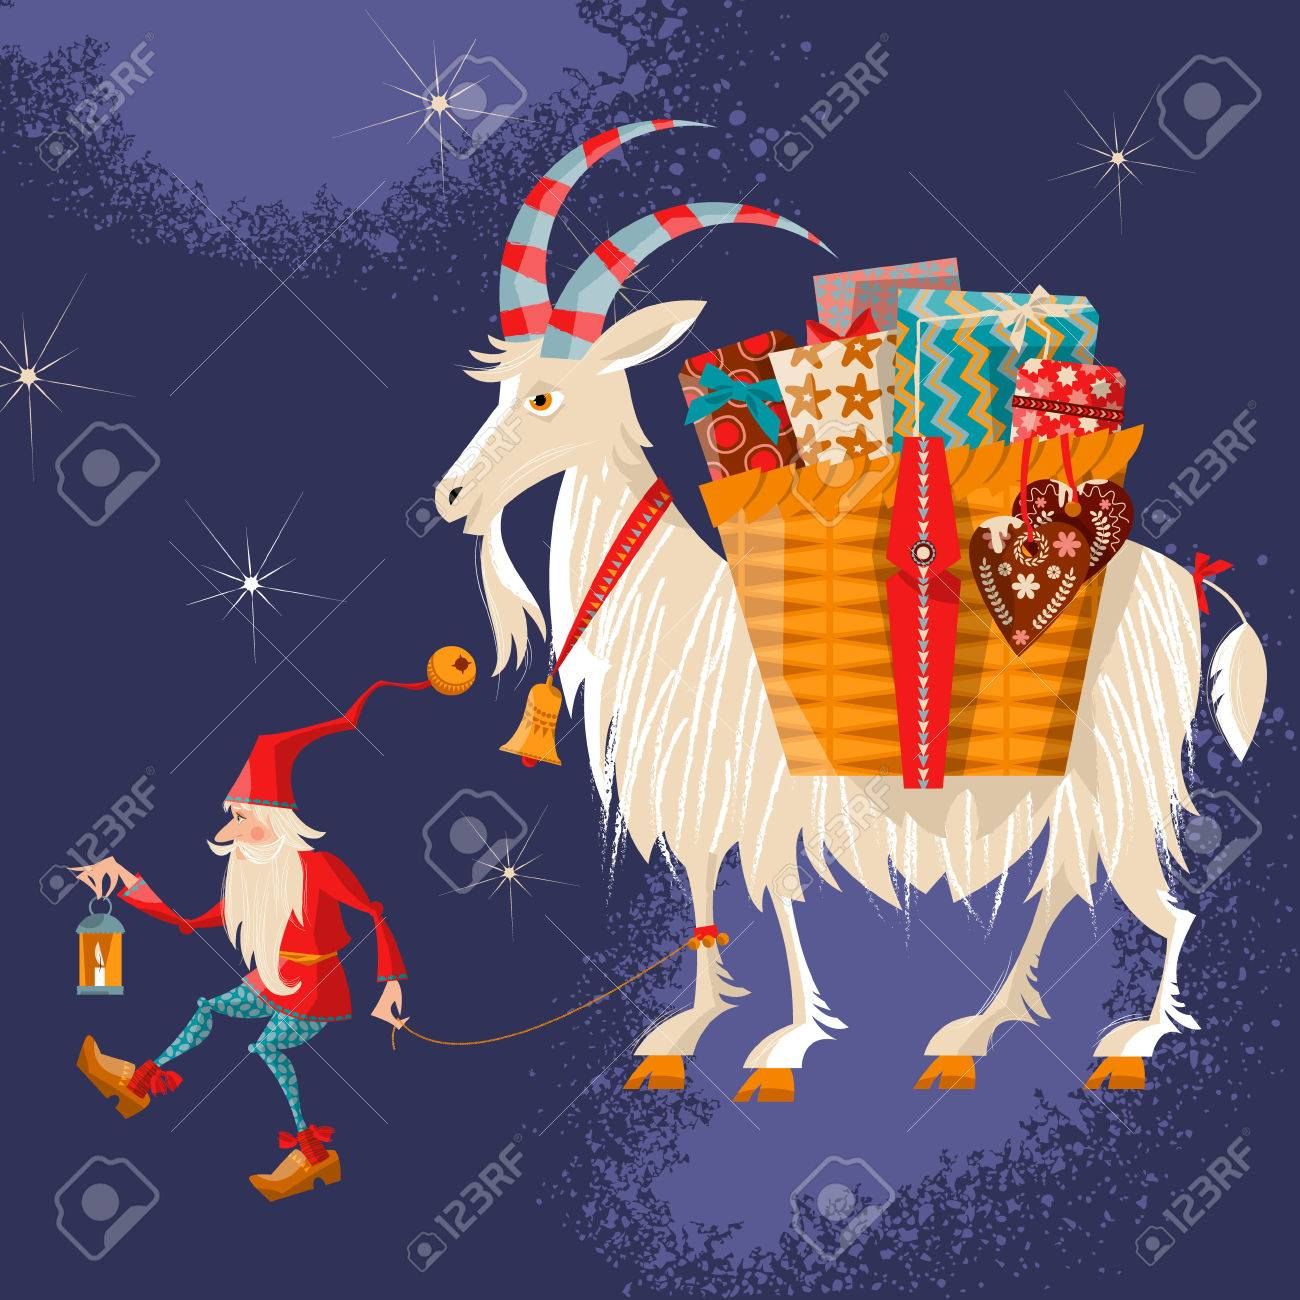 Christmas Goat.Scandinavian Christmas Tradition Christmas Gnome And Yule Goat